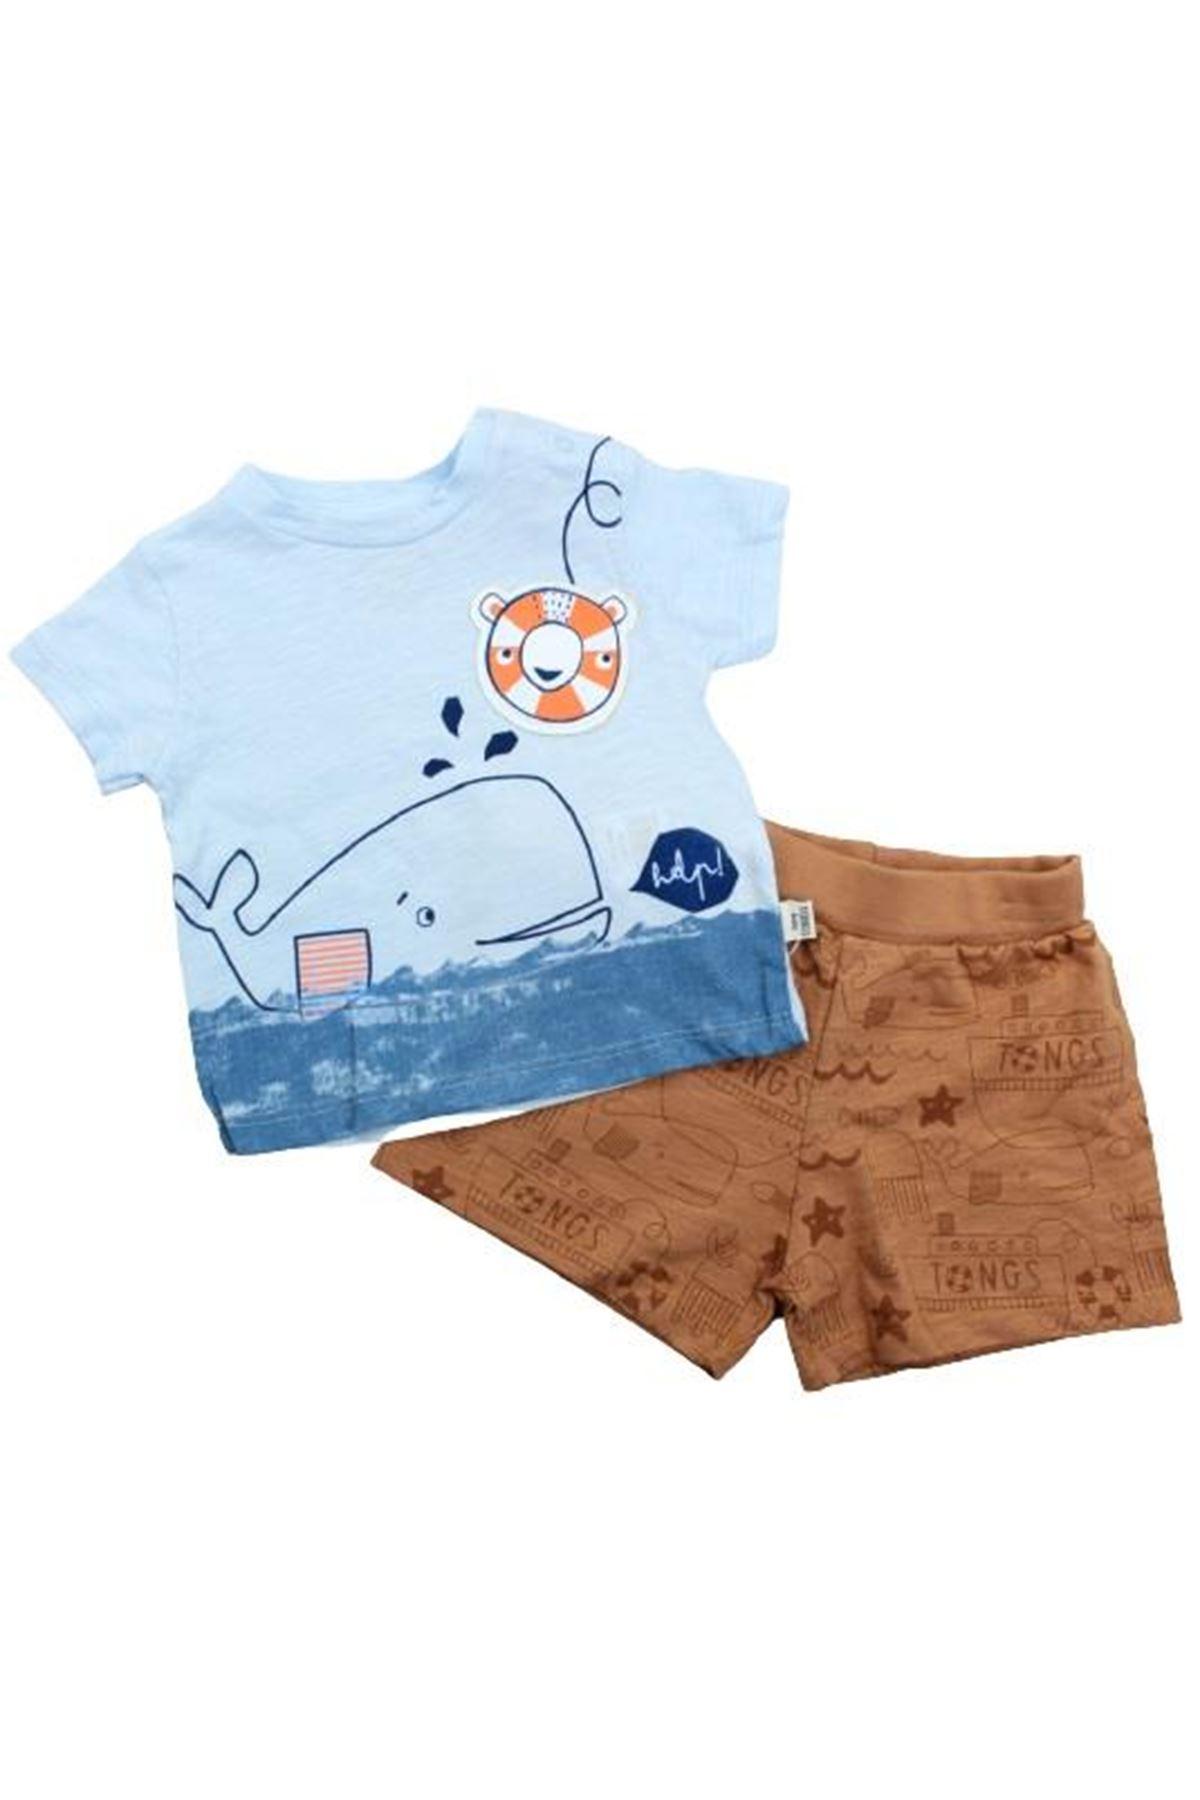 Tongs Baby Under The Sea 2li Bebe Takım 2852 Kahve